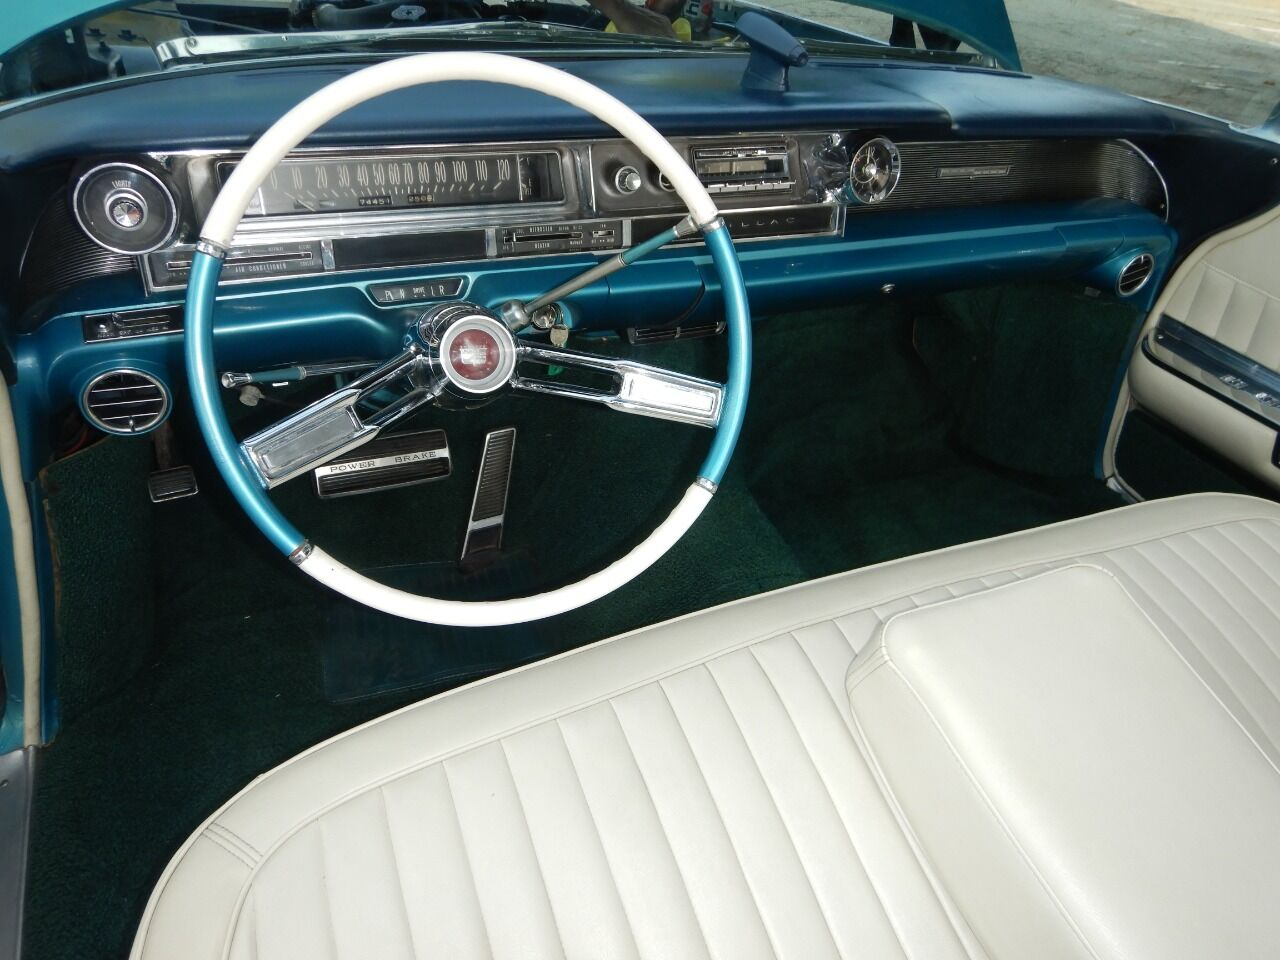 1961 Cadillac Eldorado Biarritz 42